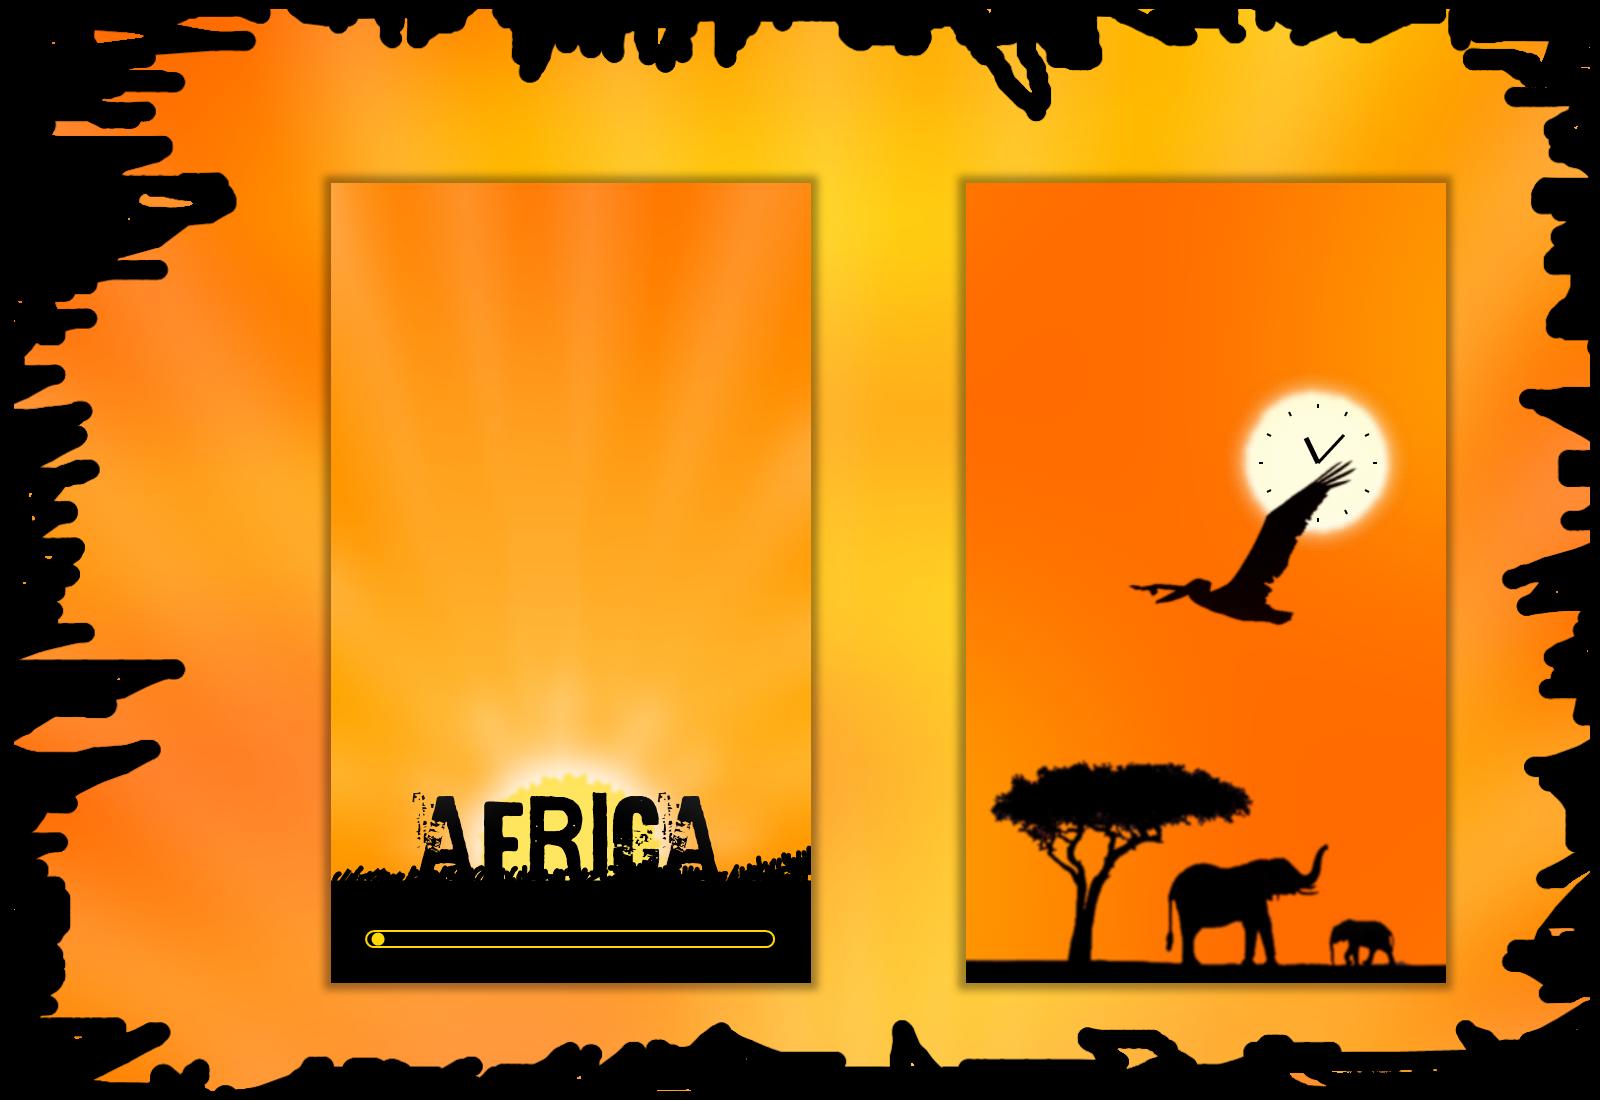 African Plains Theme by SilentWard on DeviantArt